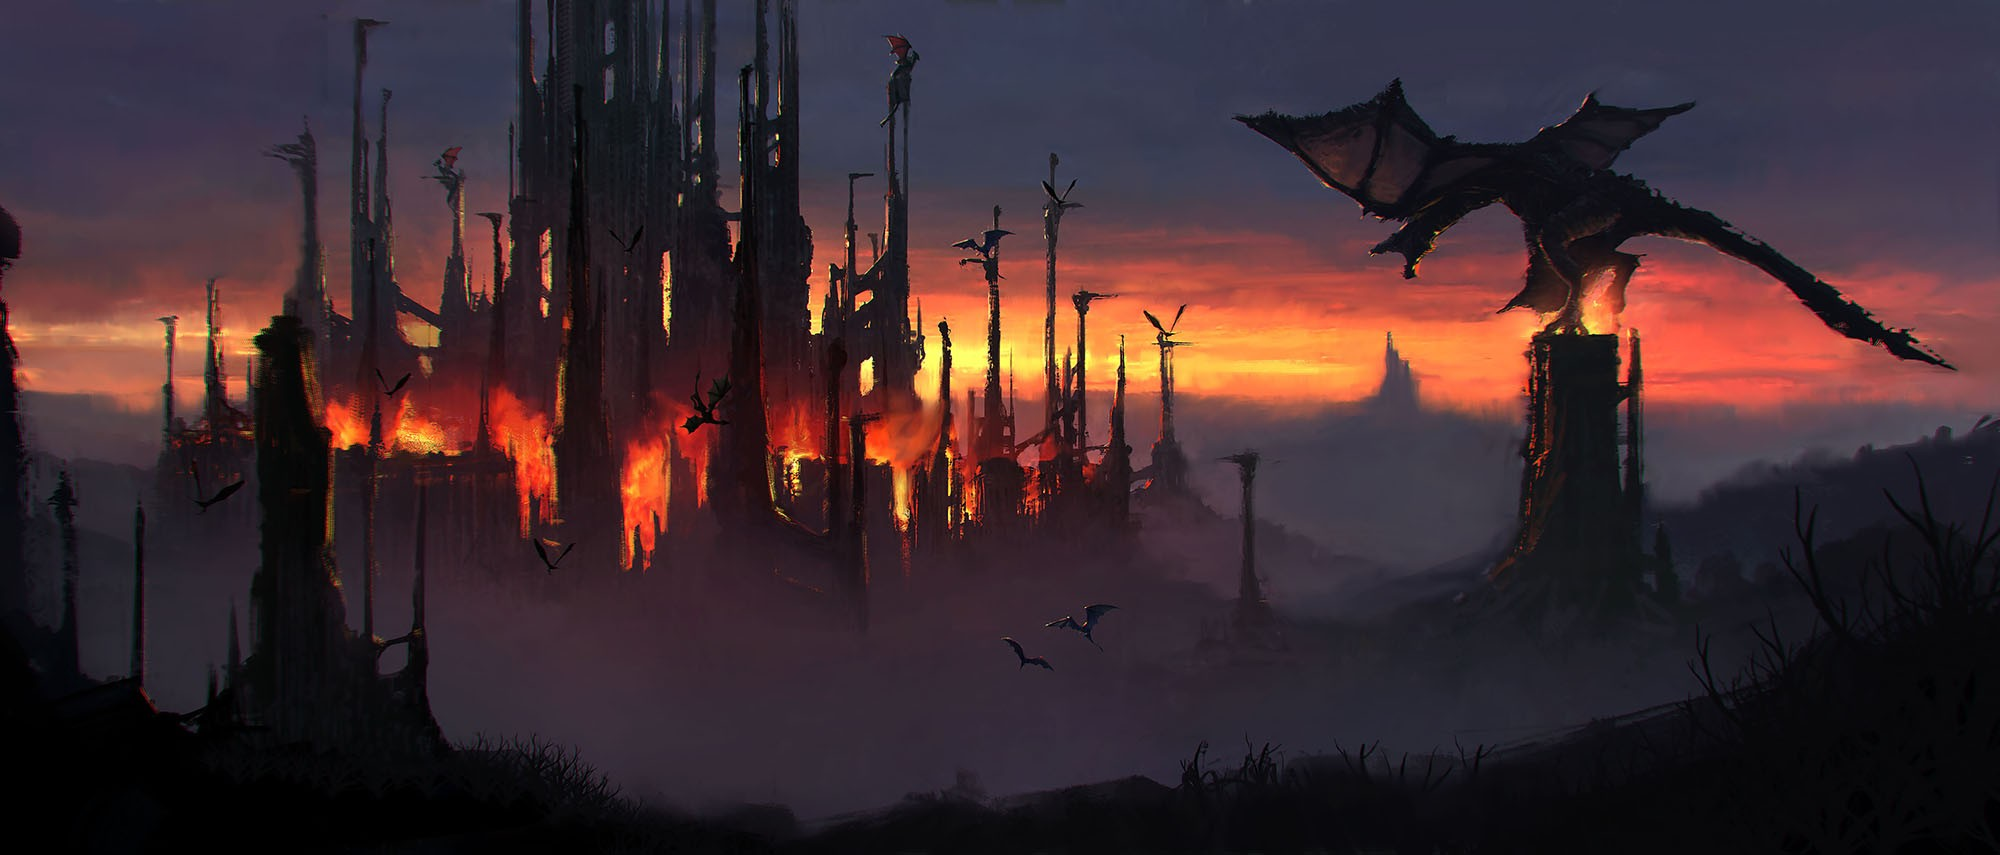 General 2000x855 dragon artwork apocalyptic fantasy art fantasy city fire dark fantasy